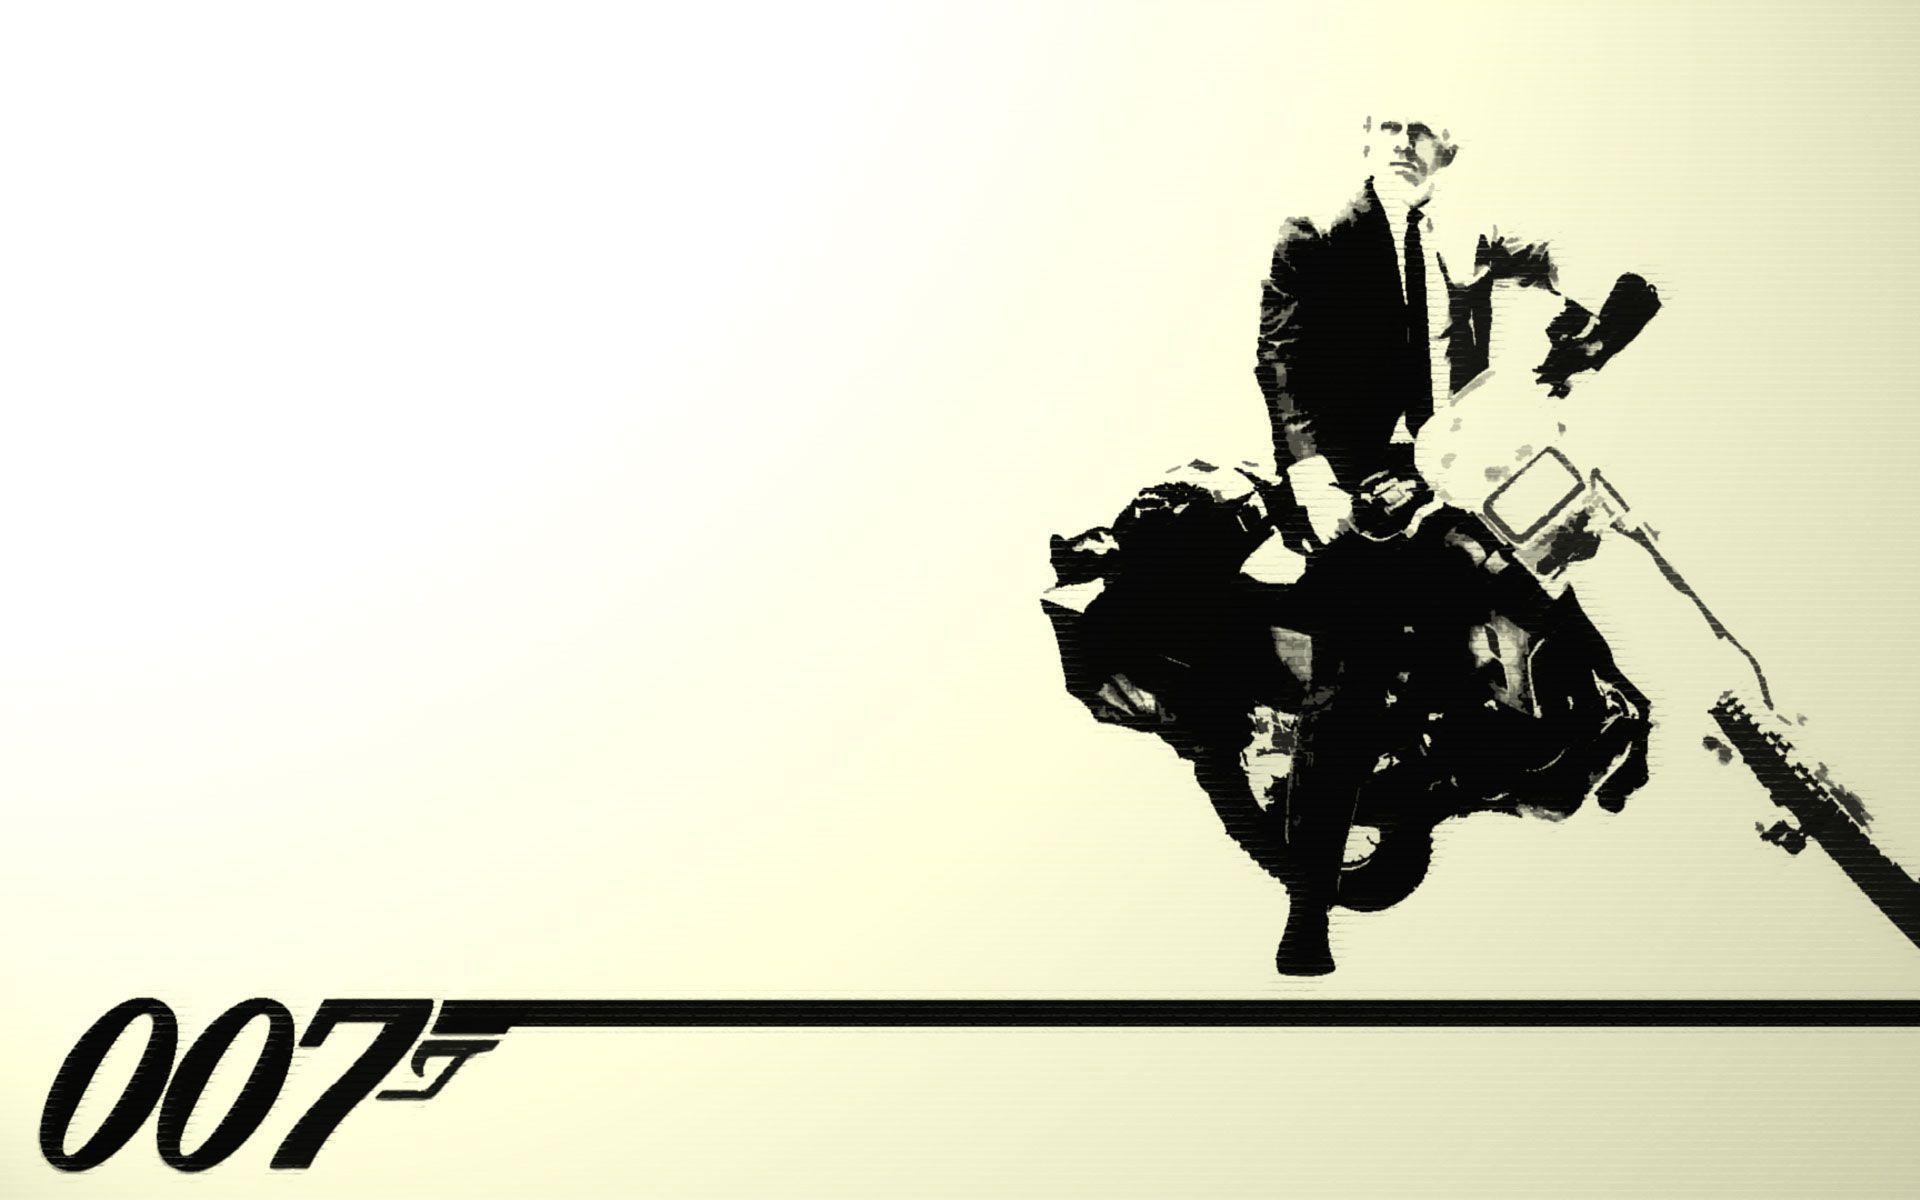 James Bond Skyfall Wallpaper Download  Freewarede